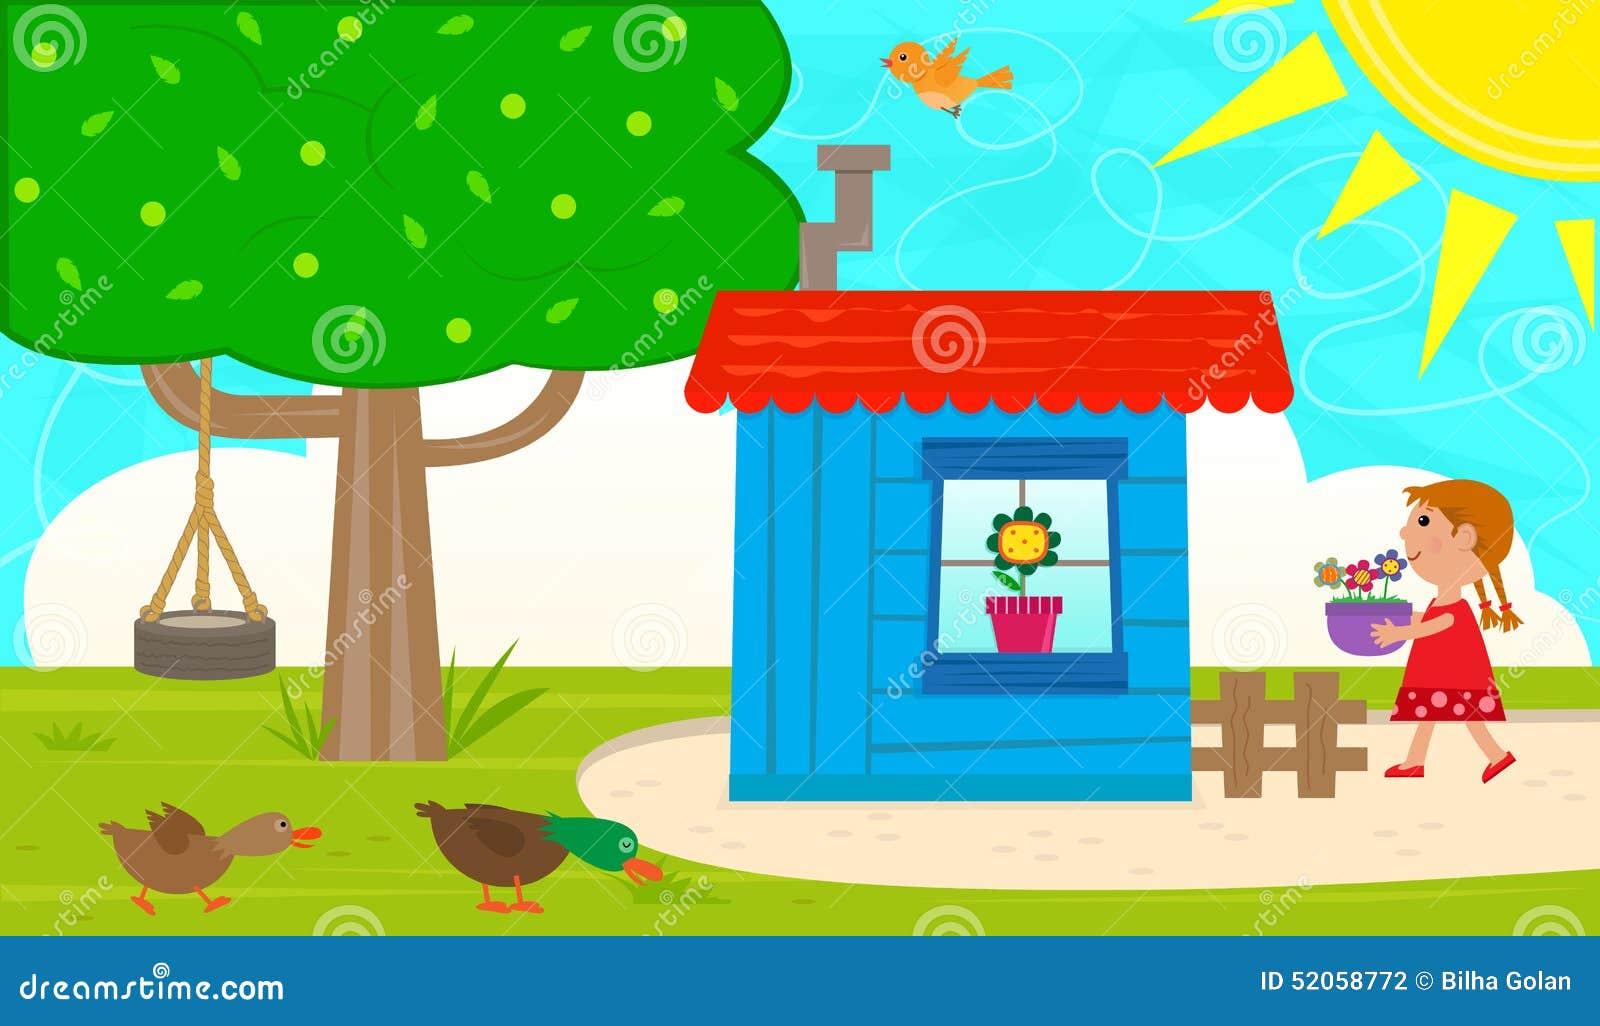 Small Garden Shed stock vector. Image of bird, spring - 52058772